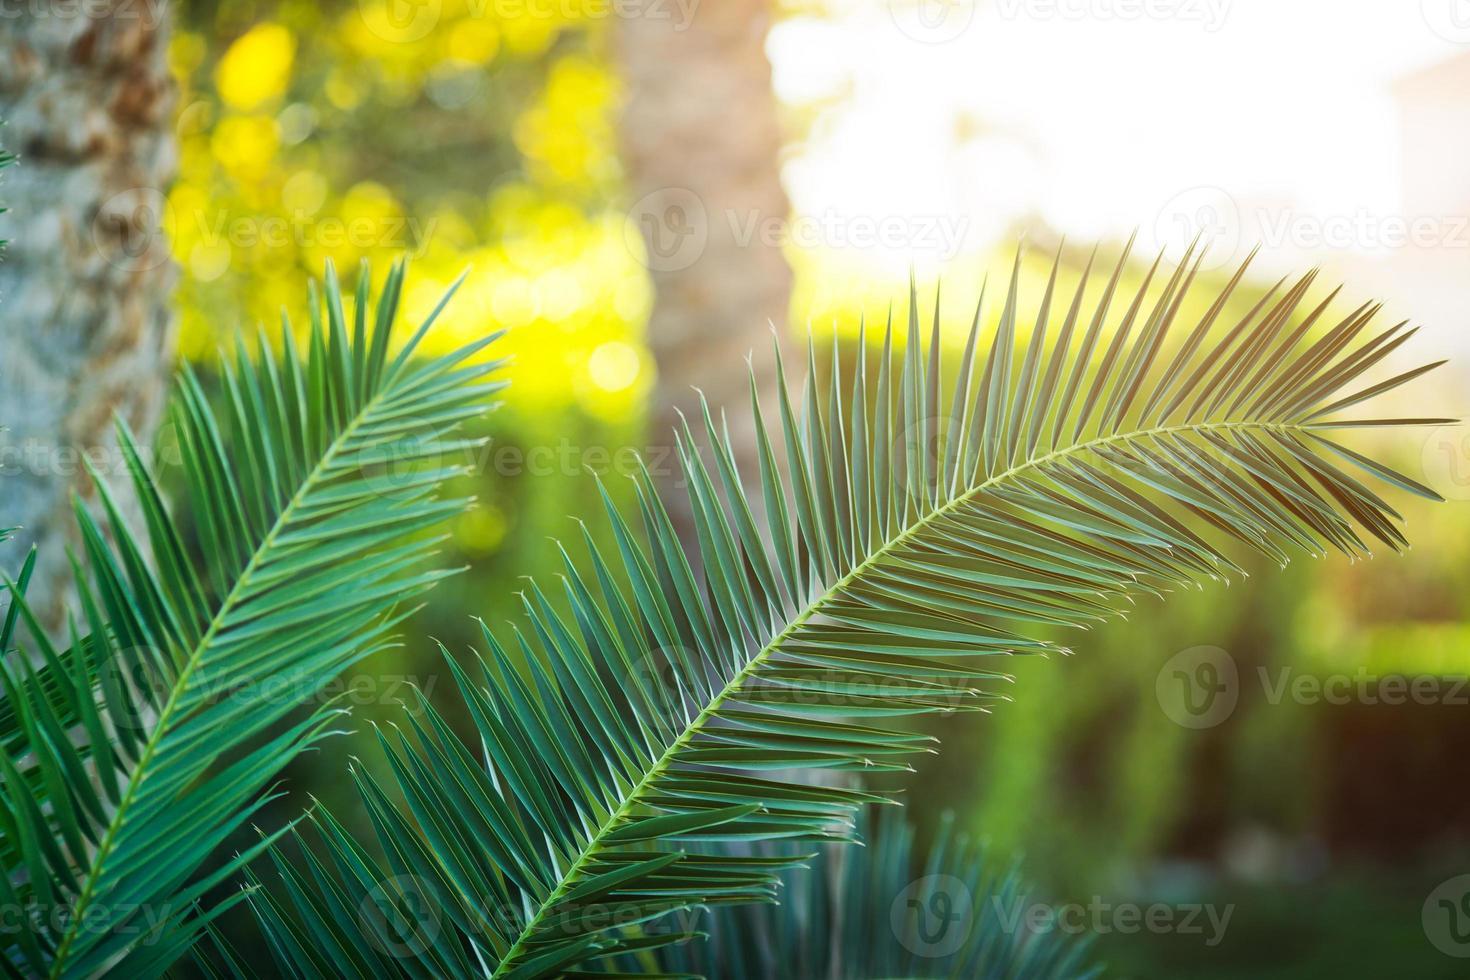 Tropical palm tree close-up photo